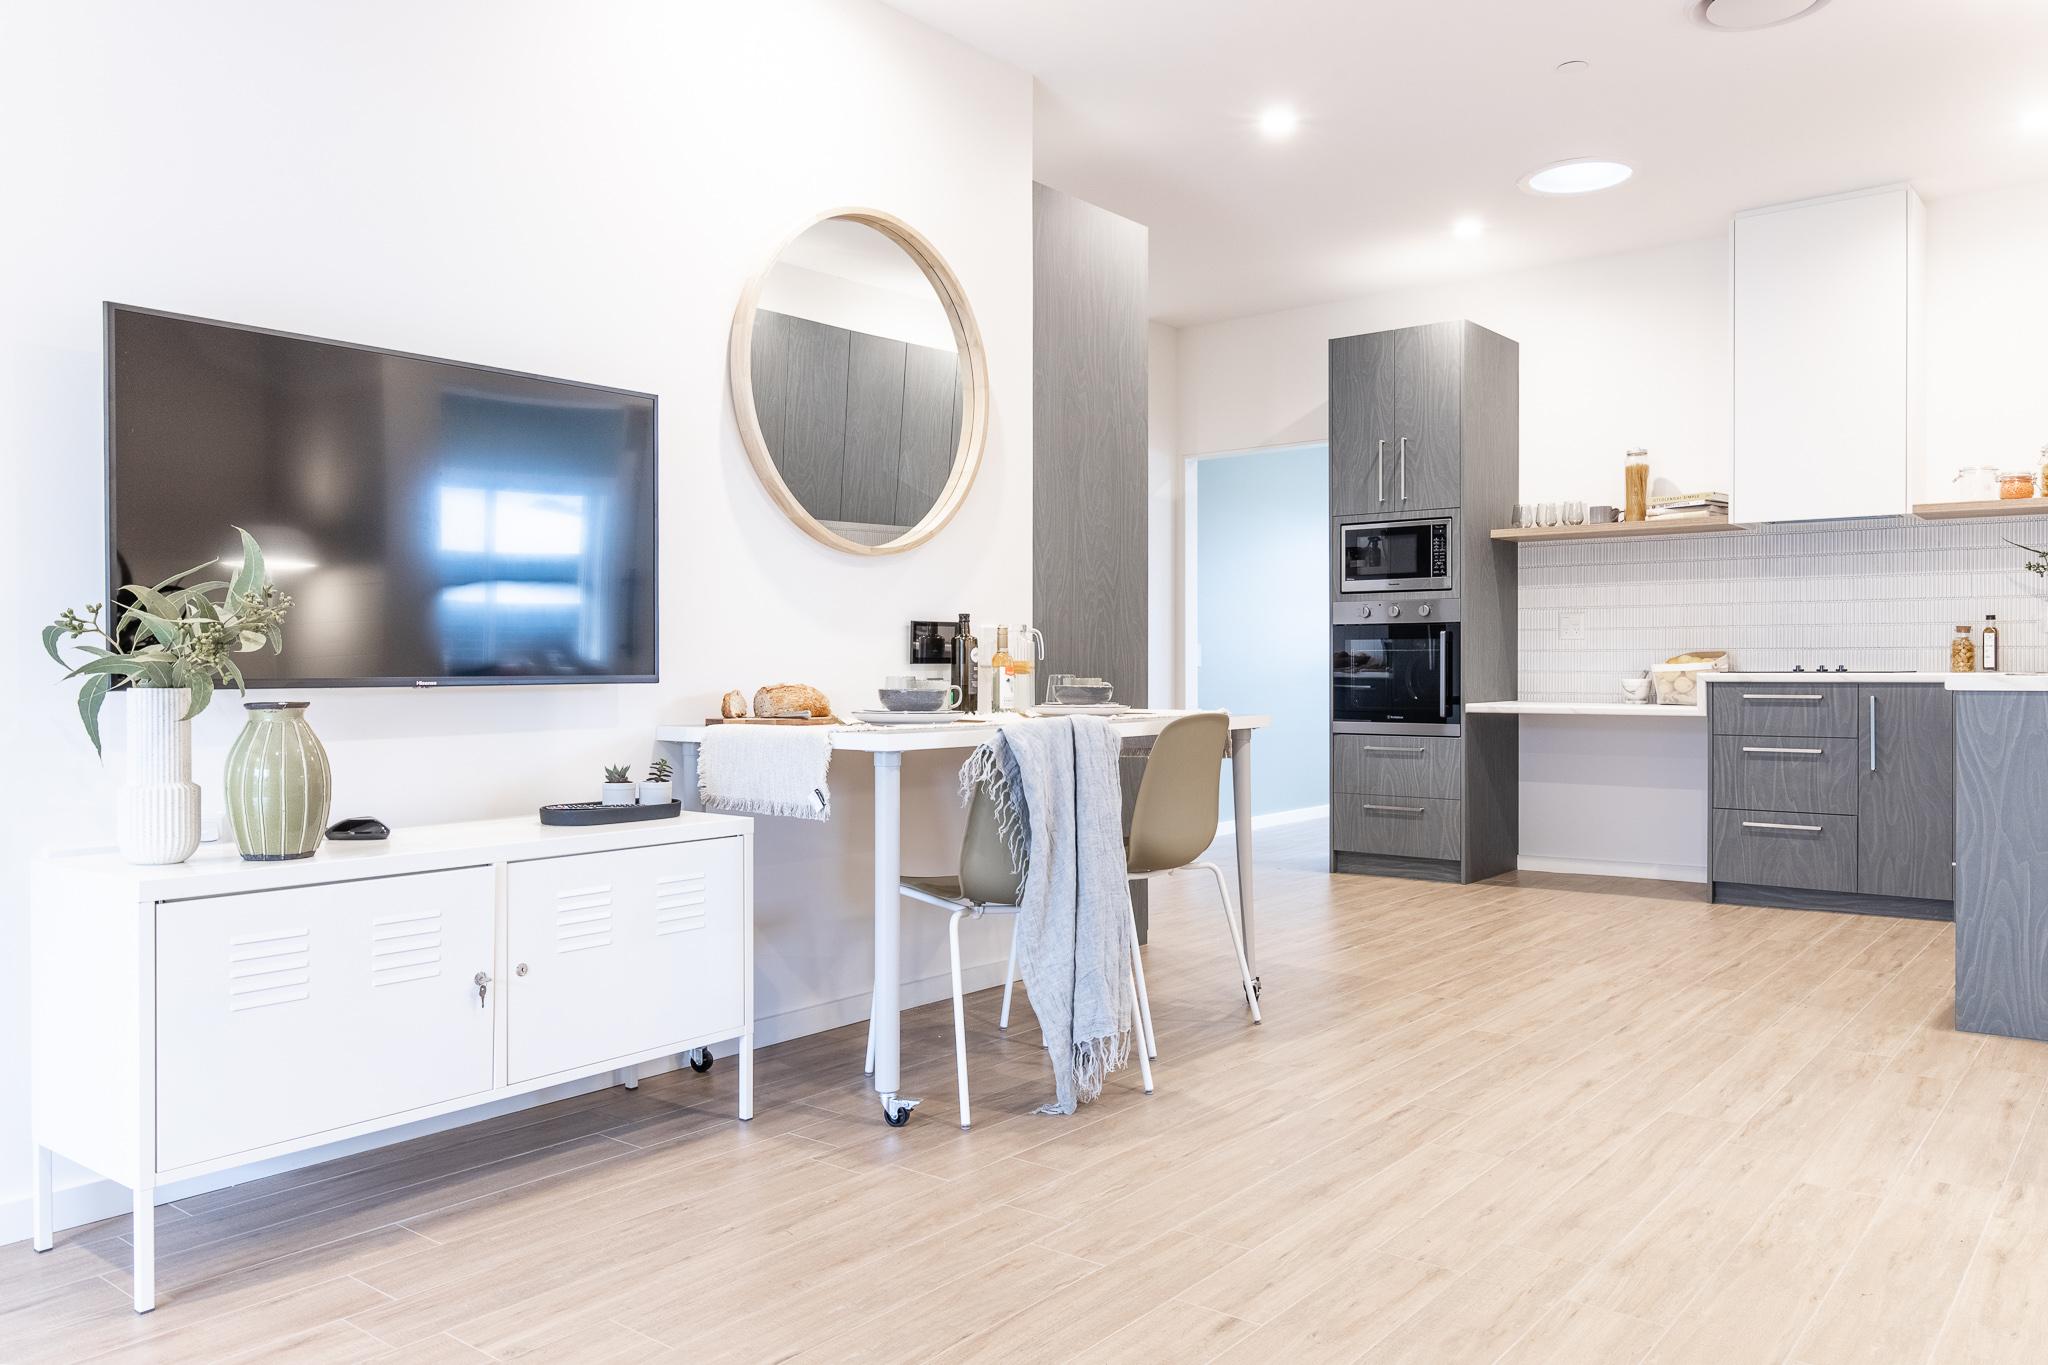 The Science of a Good Home: Interior Design + Décor